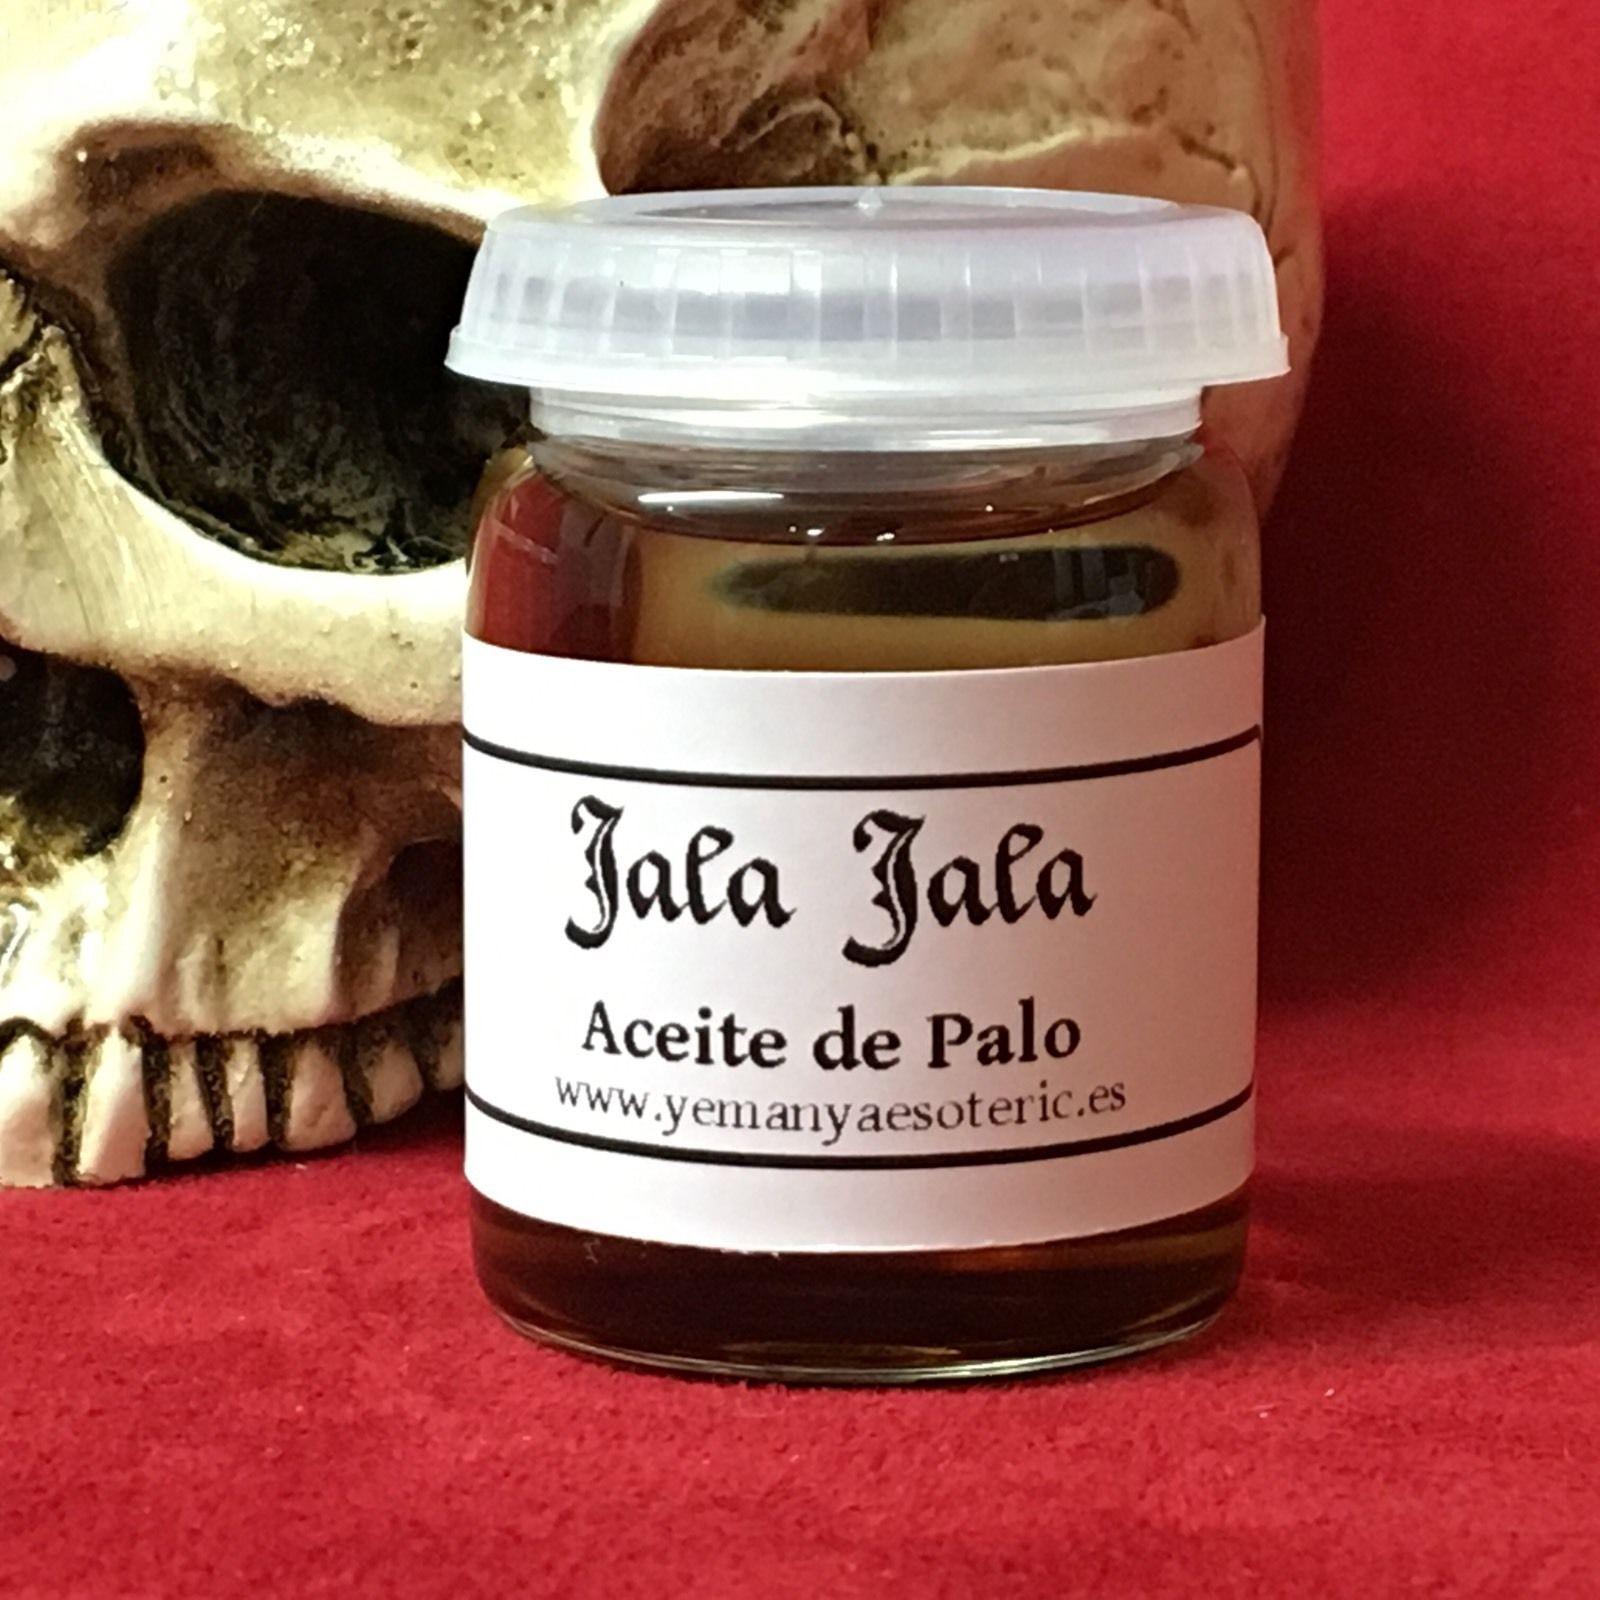 ☆ ACEITE ESOTERICO DE PALO JALA JALA ☆ RITUAL OIL ☆ 15ml.